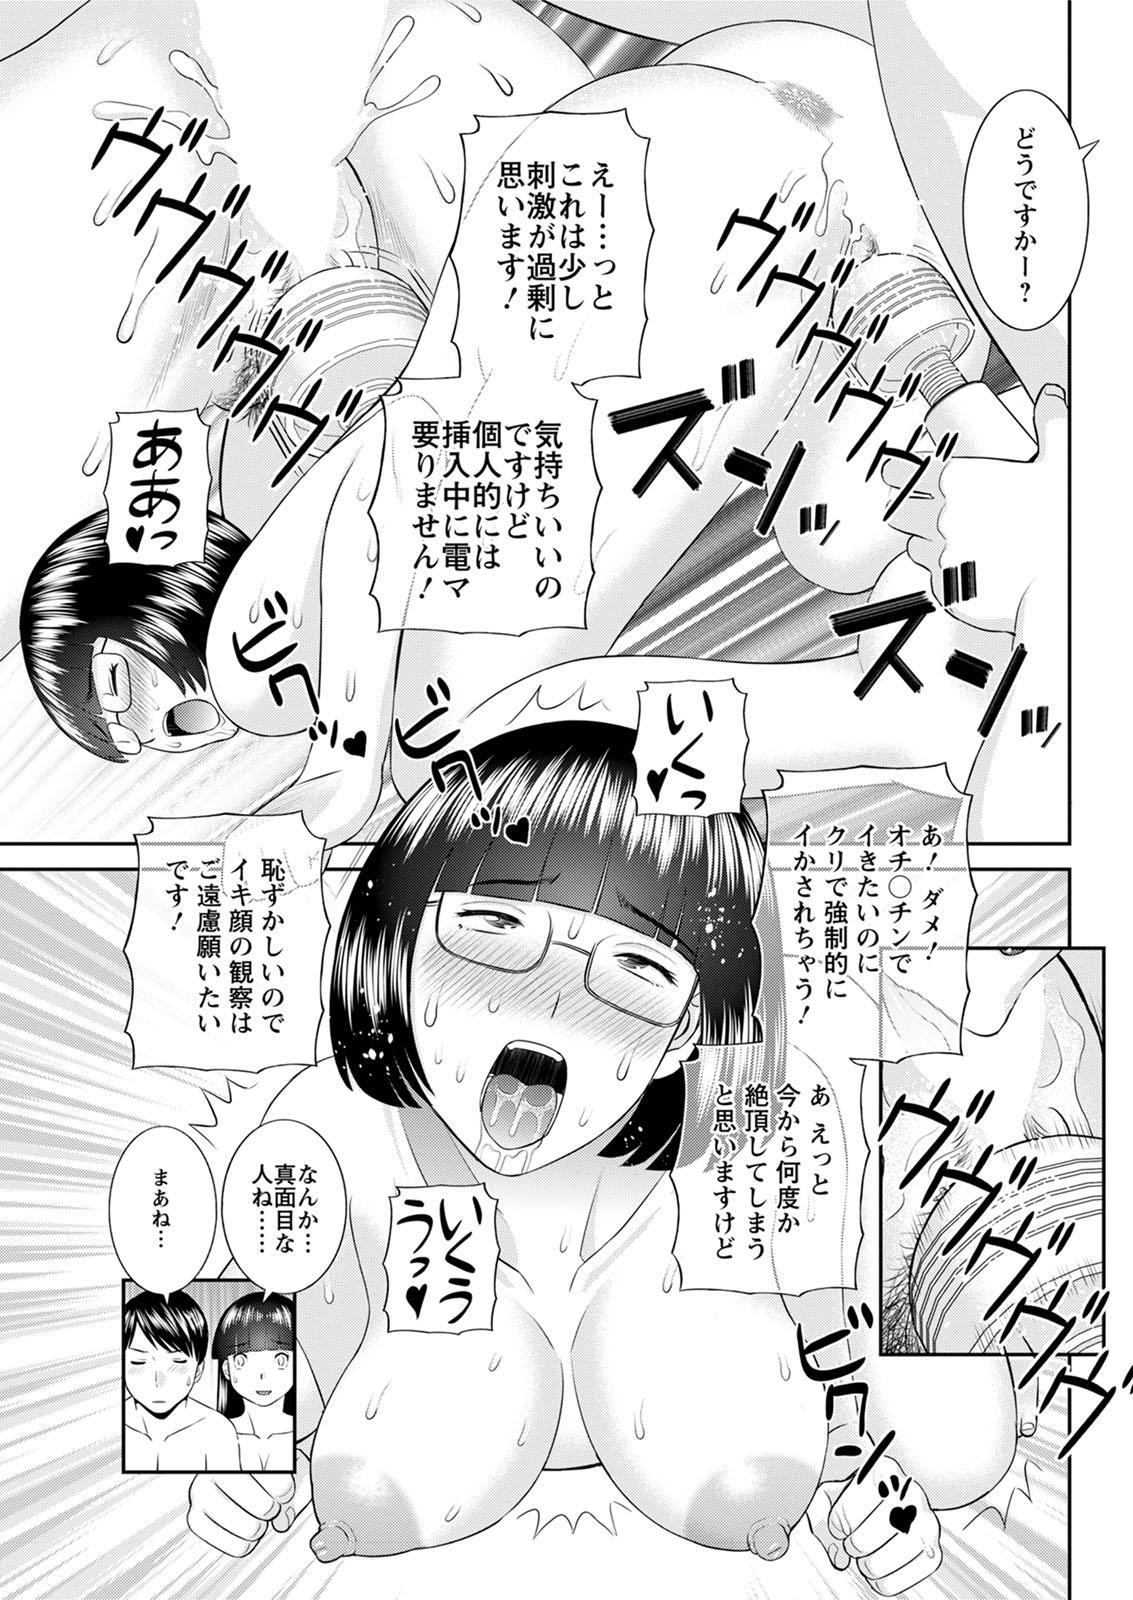 [Kawamori Misaki] Kaikan Hitotsuma Gakuen Ch. 1-6, 8-20 [Digital] 273